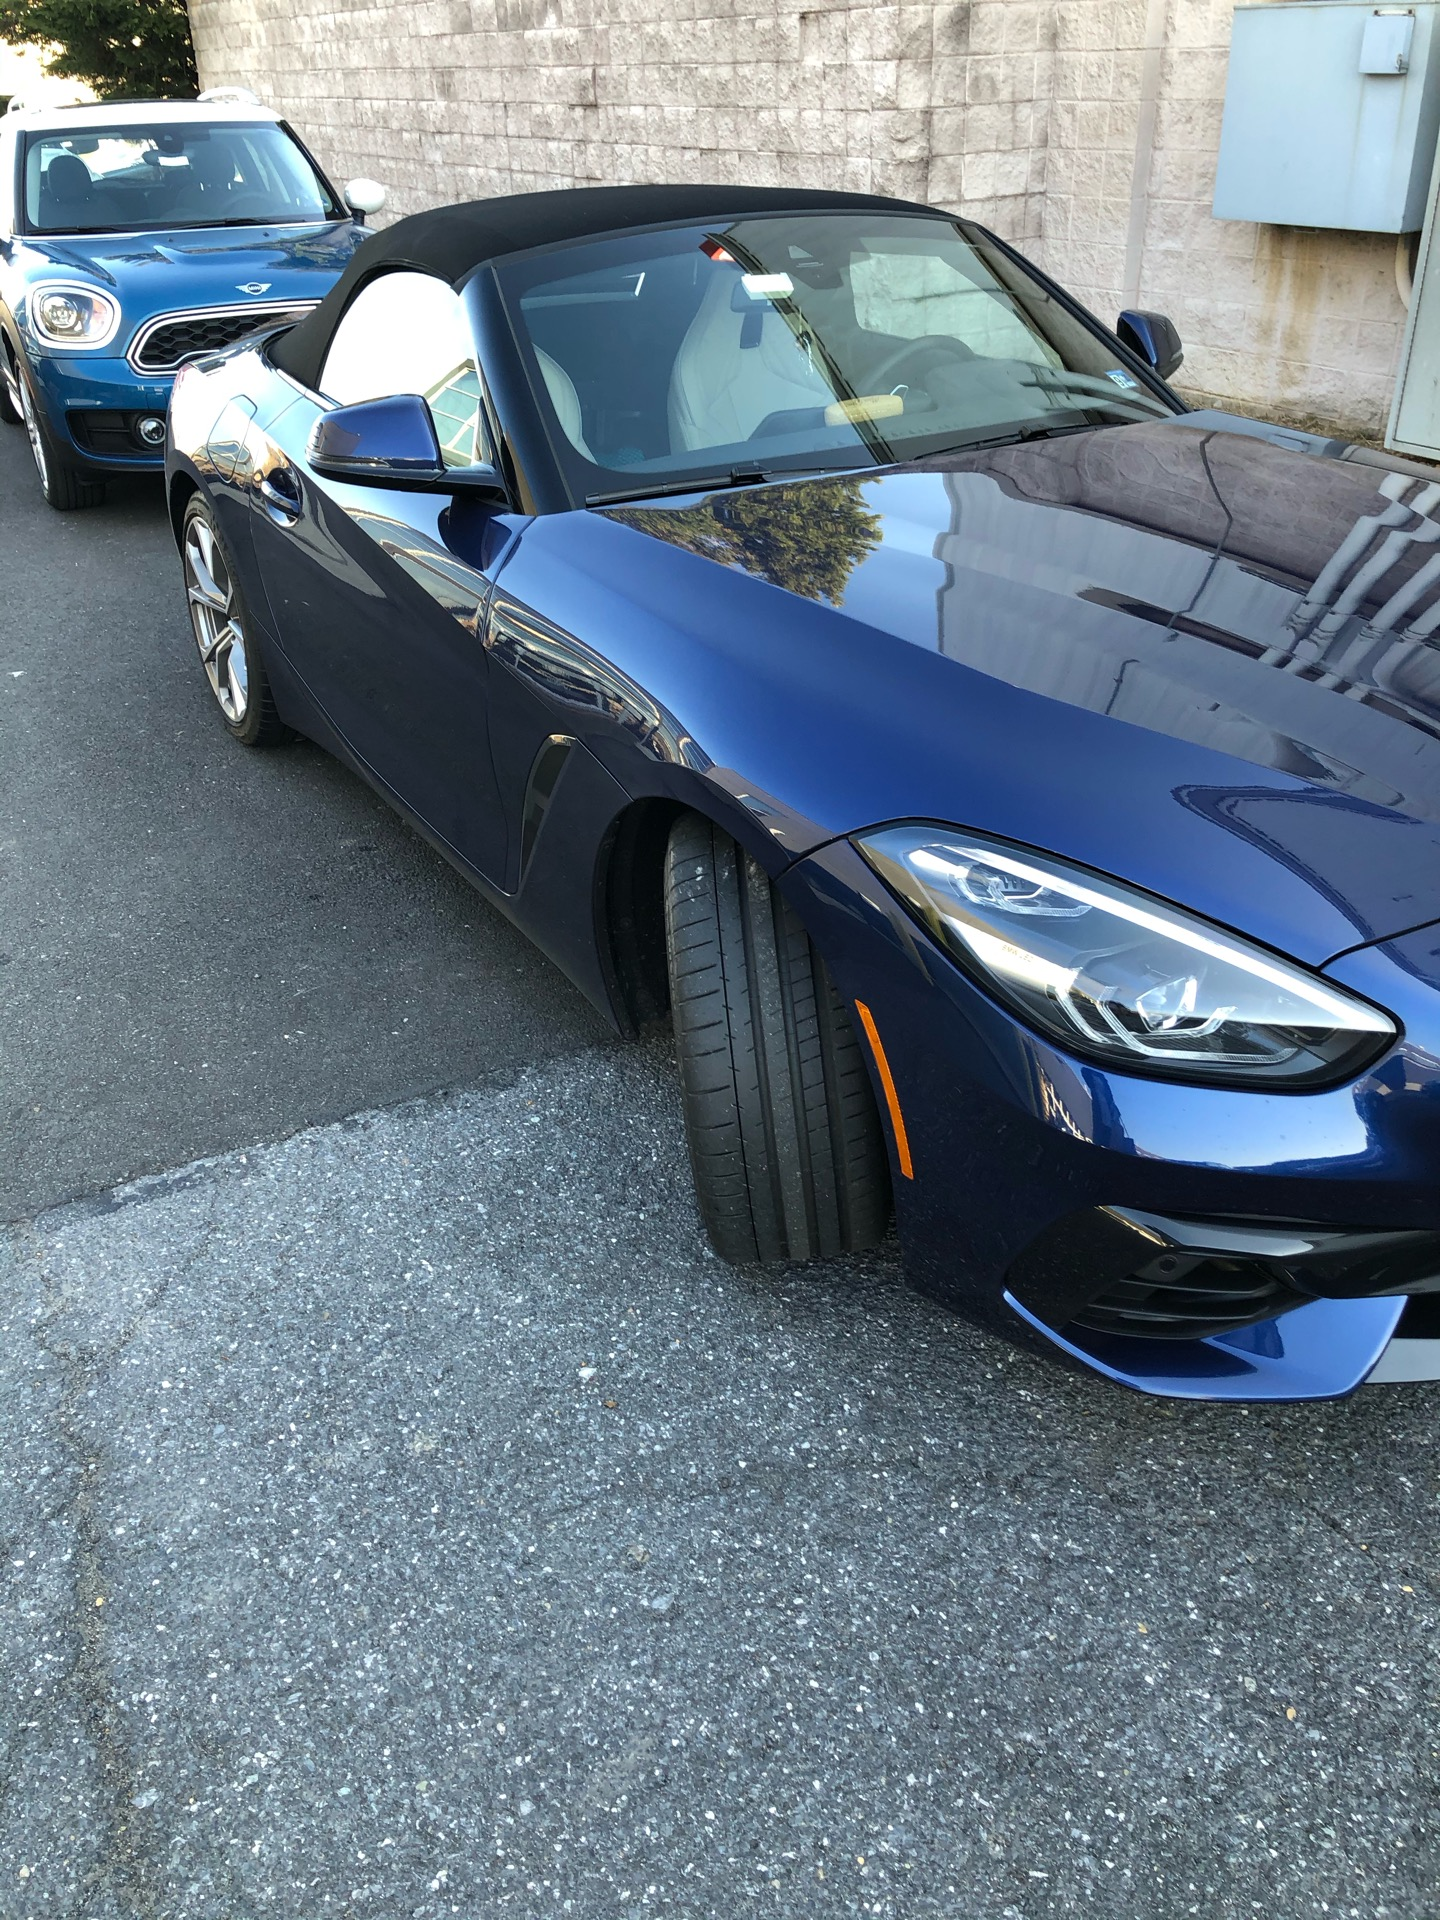 BMW Z4 2020 Lease Deals in Alexandria, Virginia   Current ...